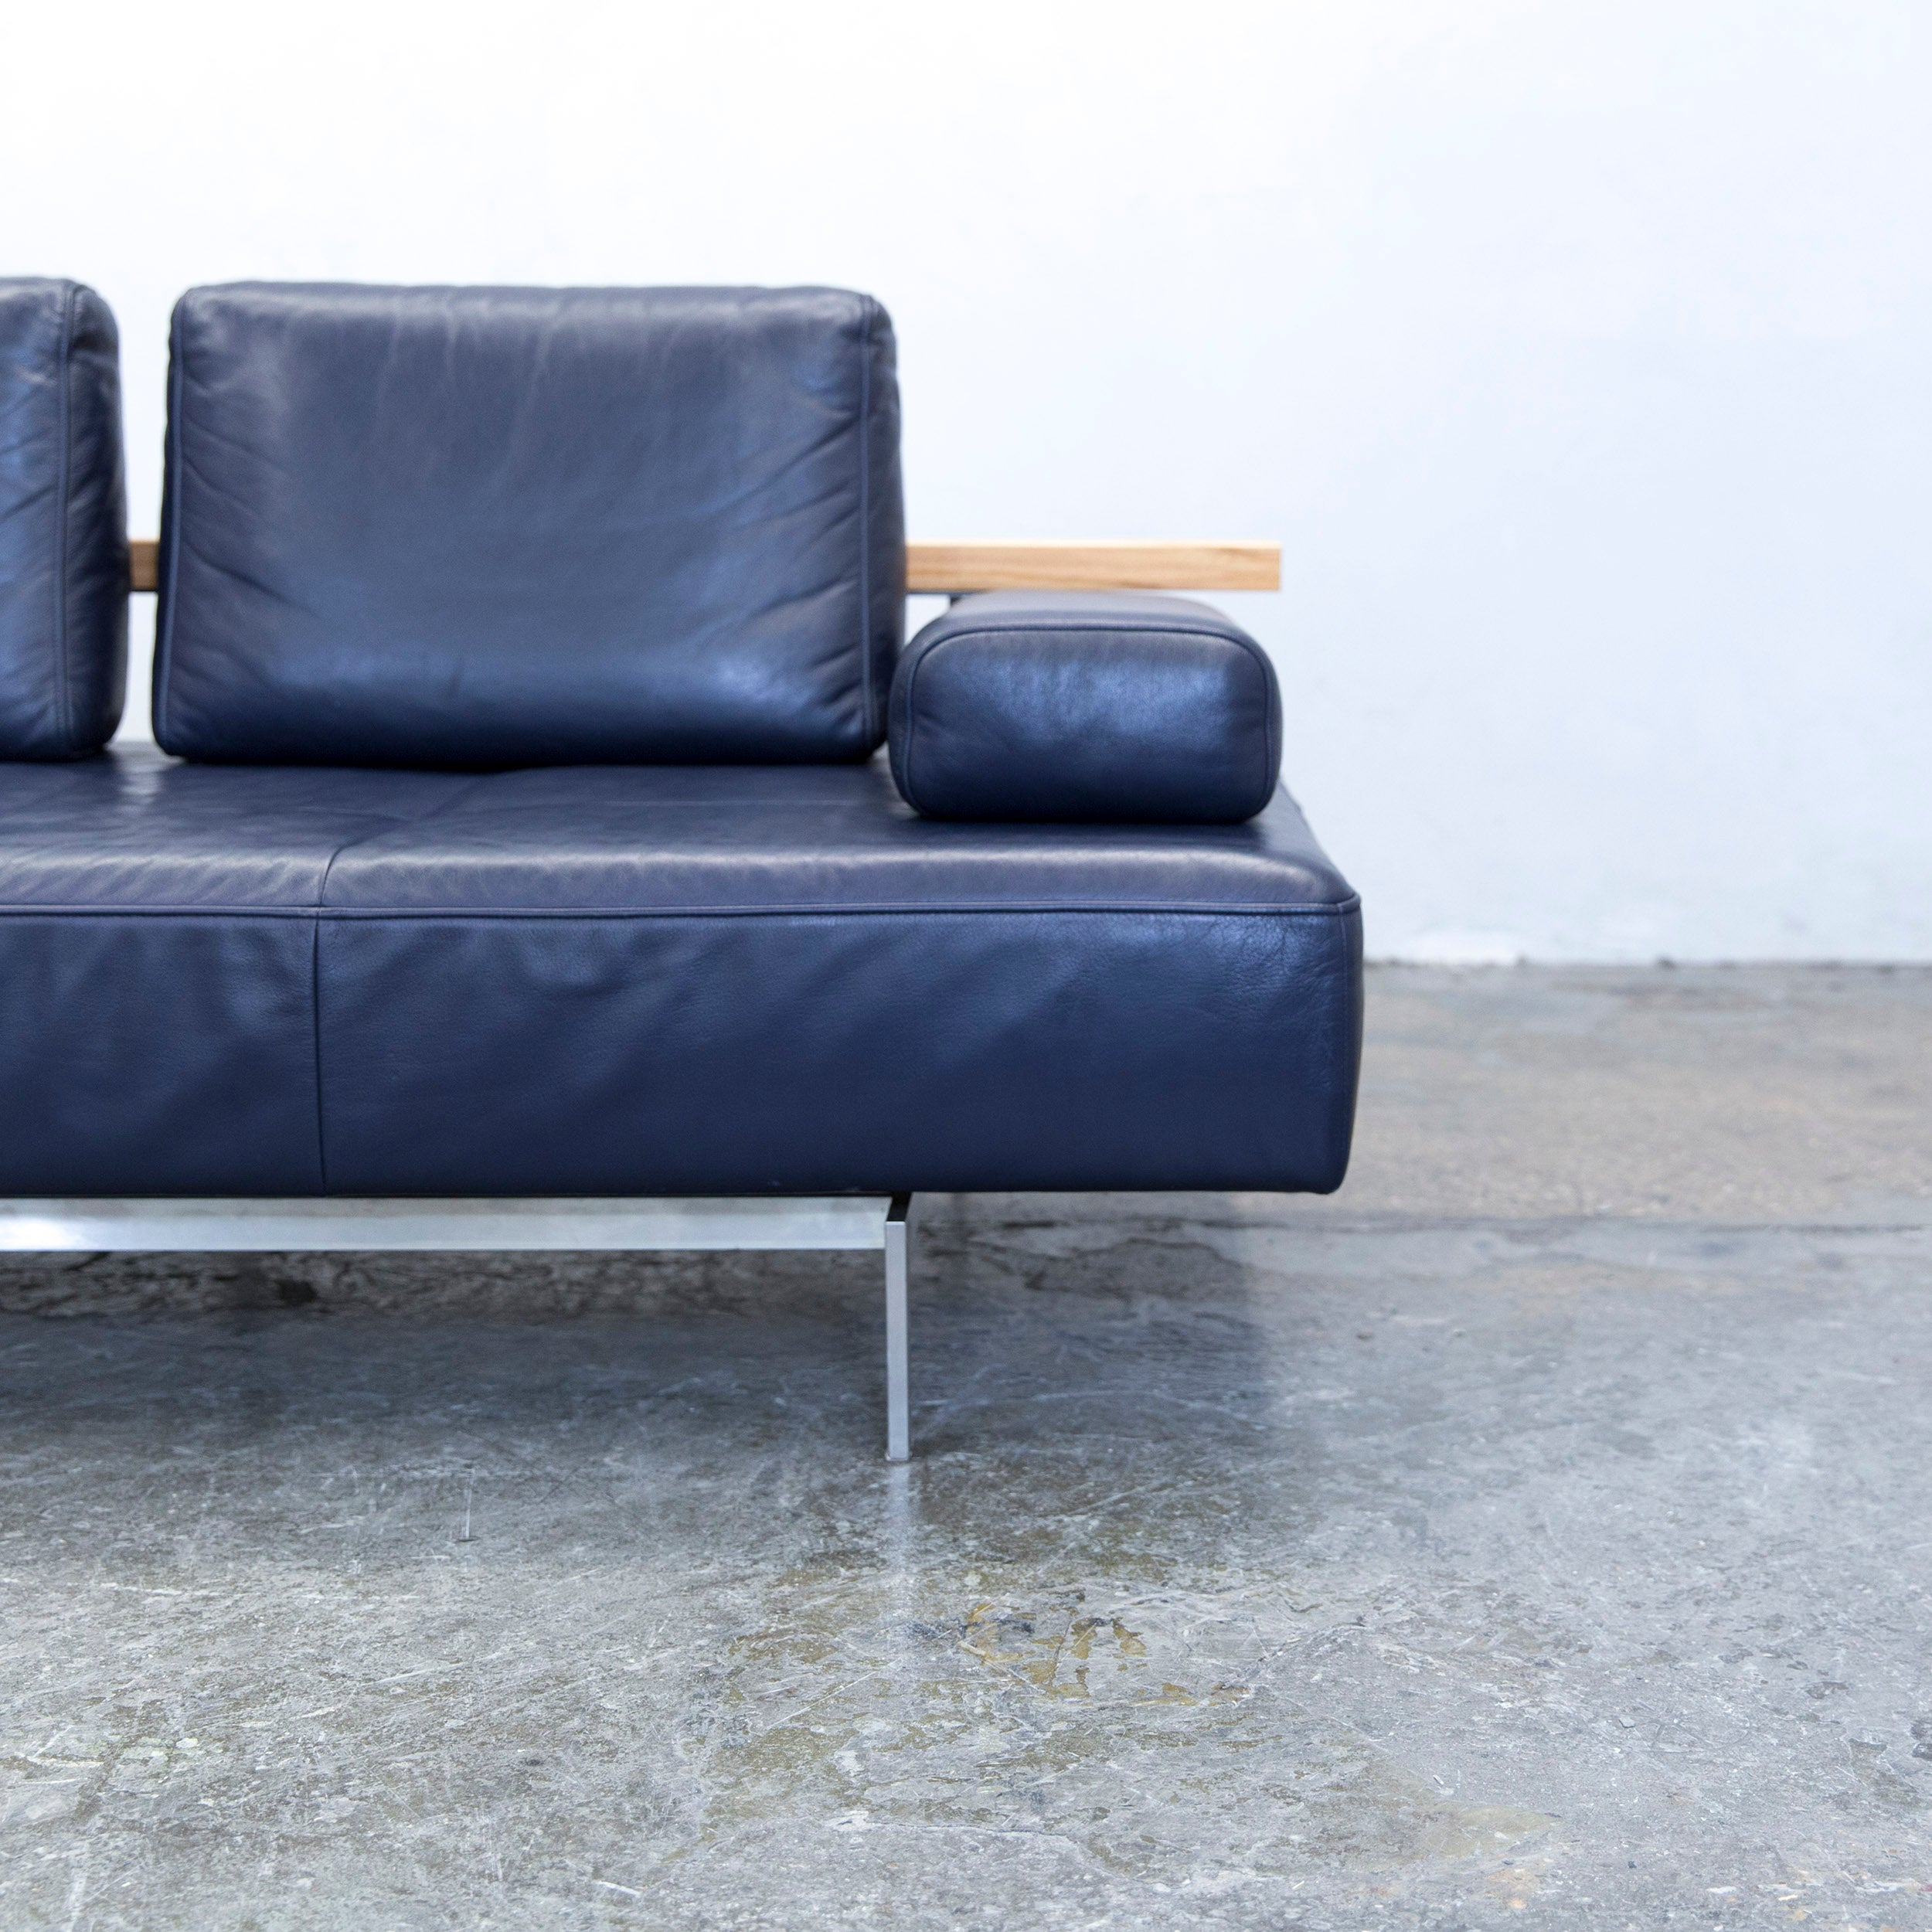 Charmant Moderne Luxus Sofa Fotos Heimat Ideen